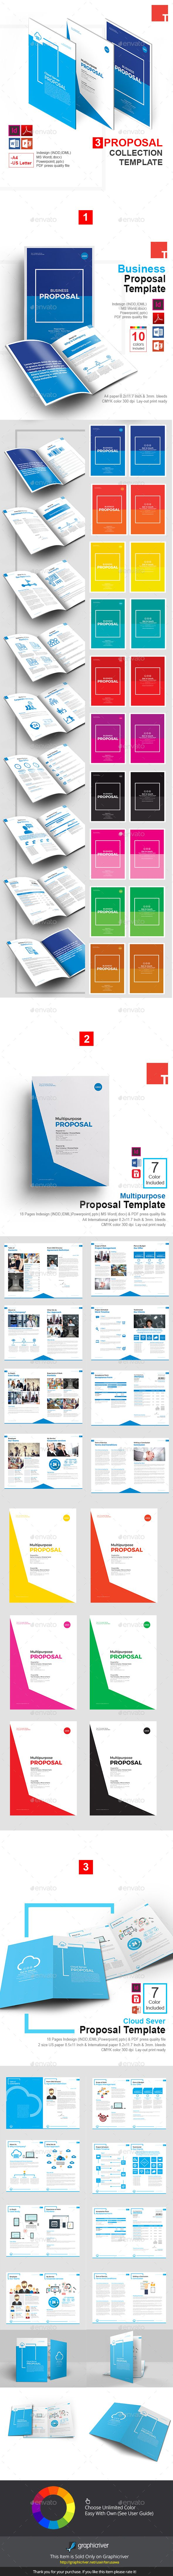 3 Collection Proposal Template Bundle By Terusawa Proposal Template